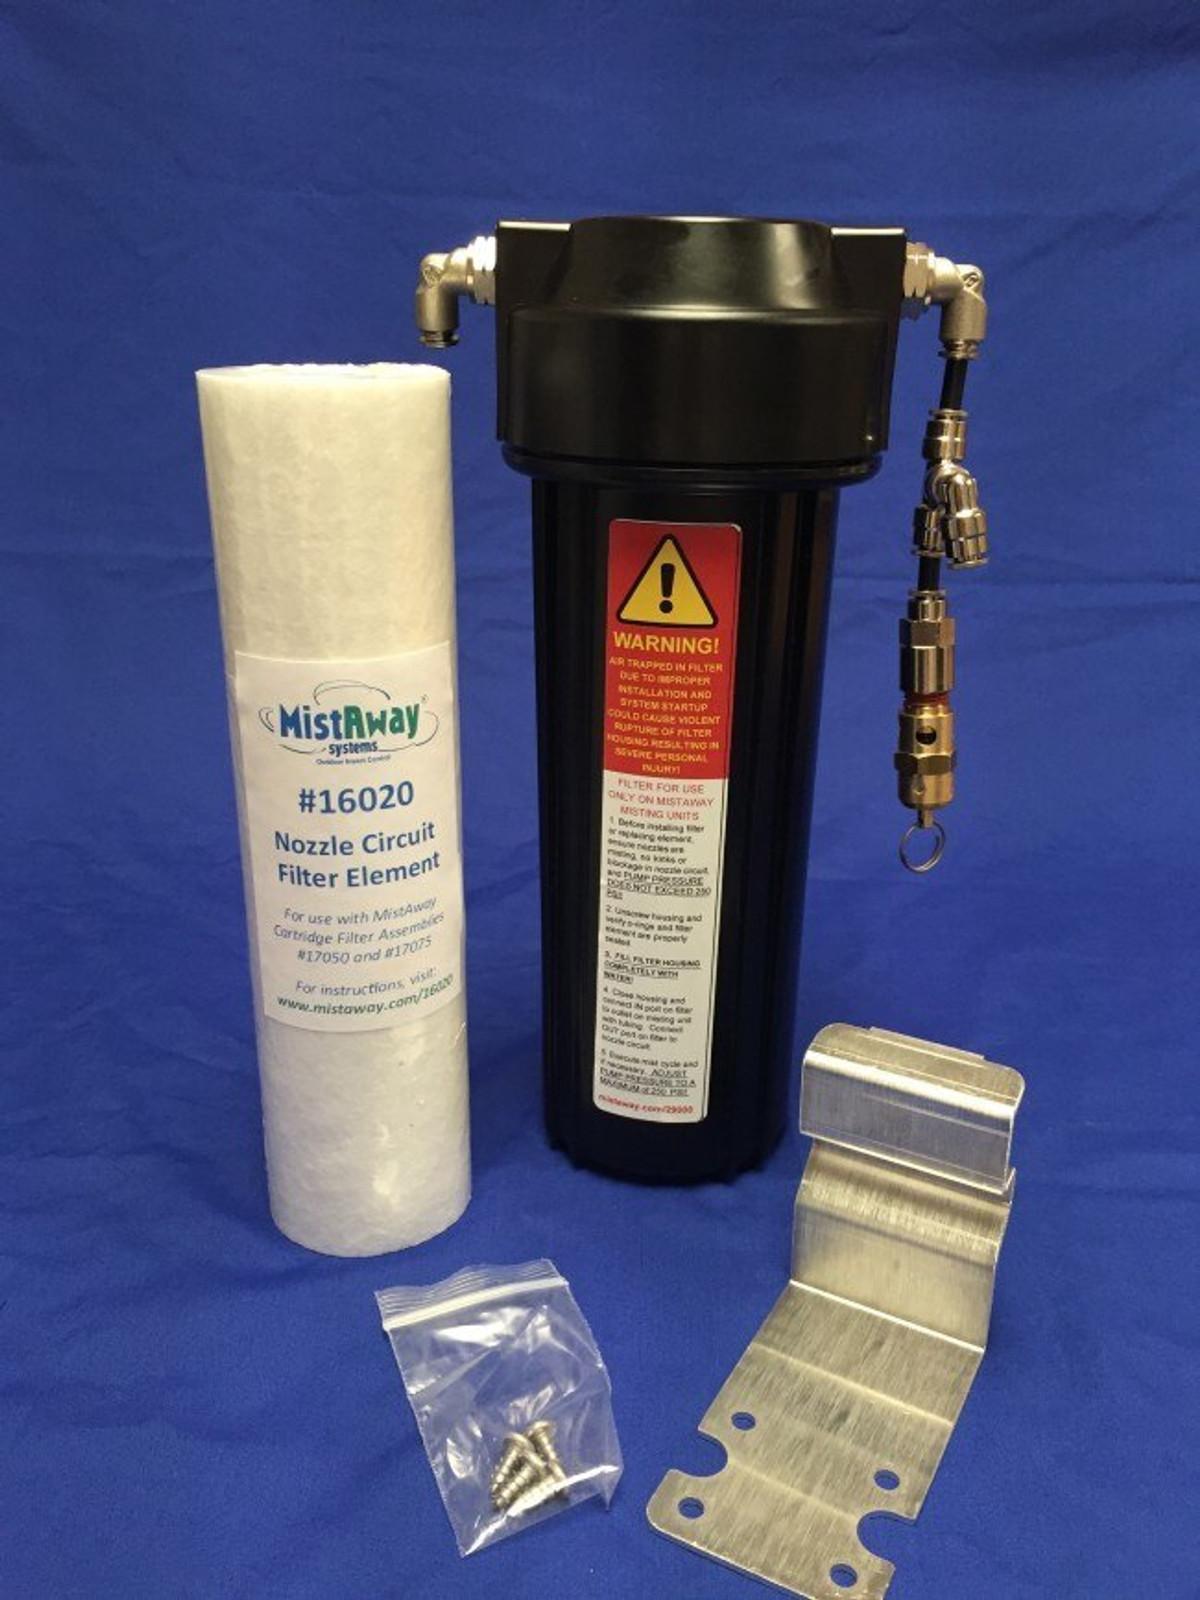 Gen 1.3 Nozzle Circuit Filter